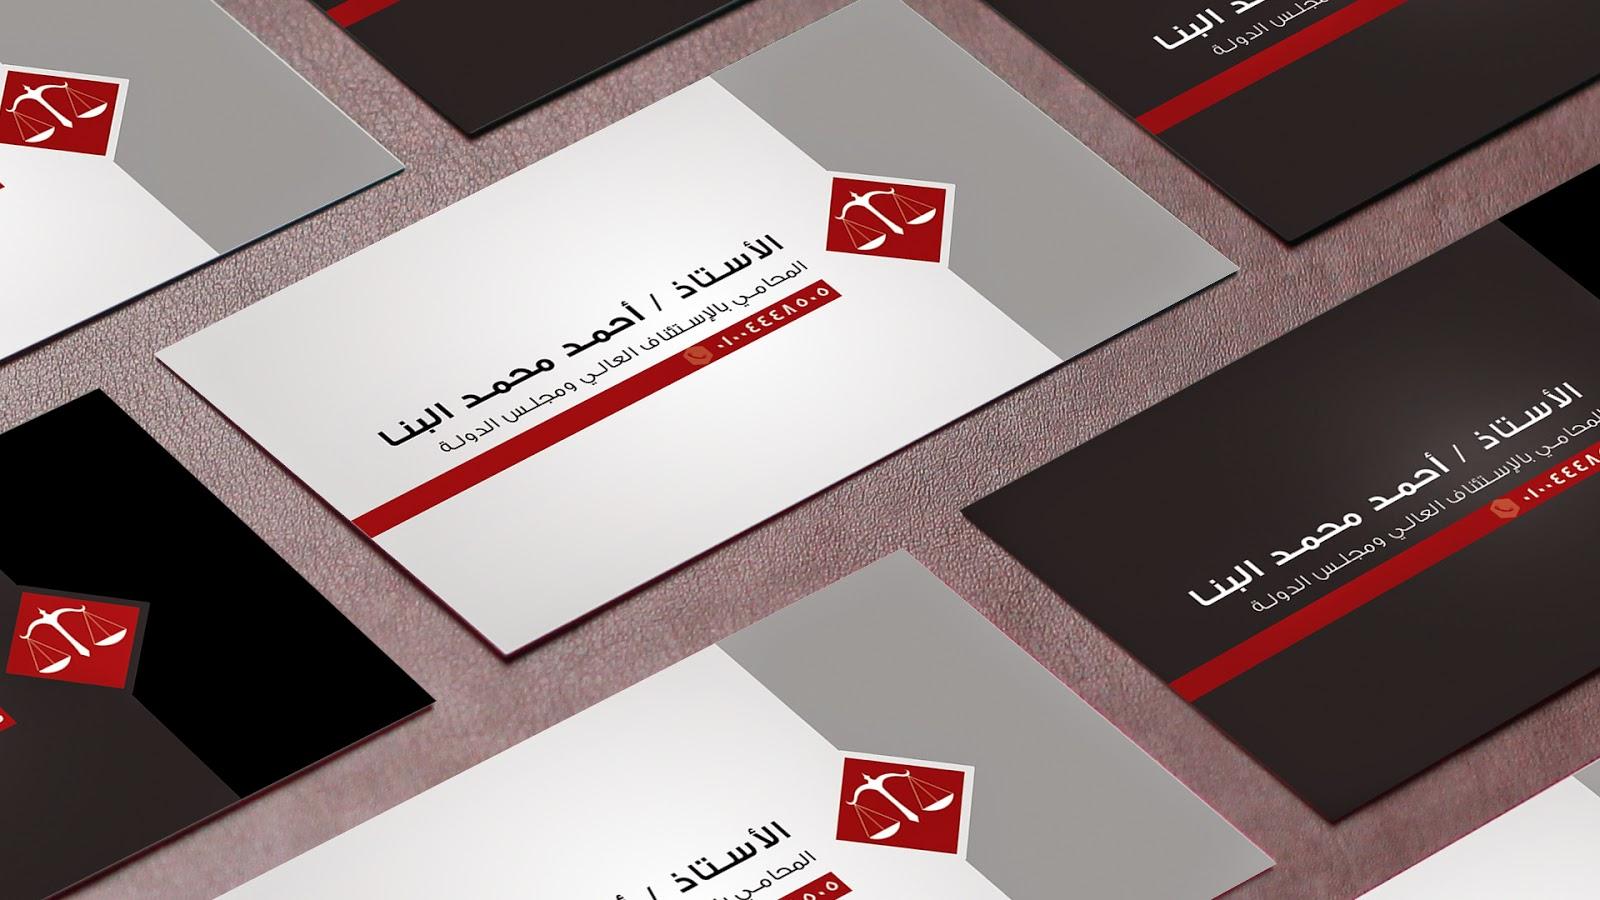 Lawyer Card [ lawyer - ahmed elbanna ] - HERO - E.E.S Designs